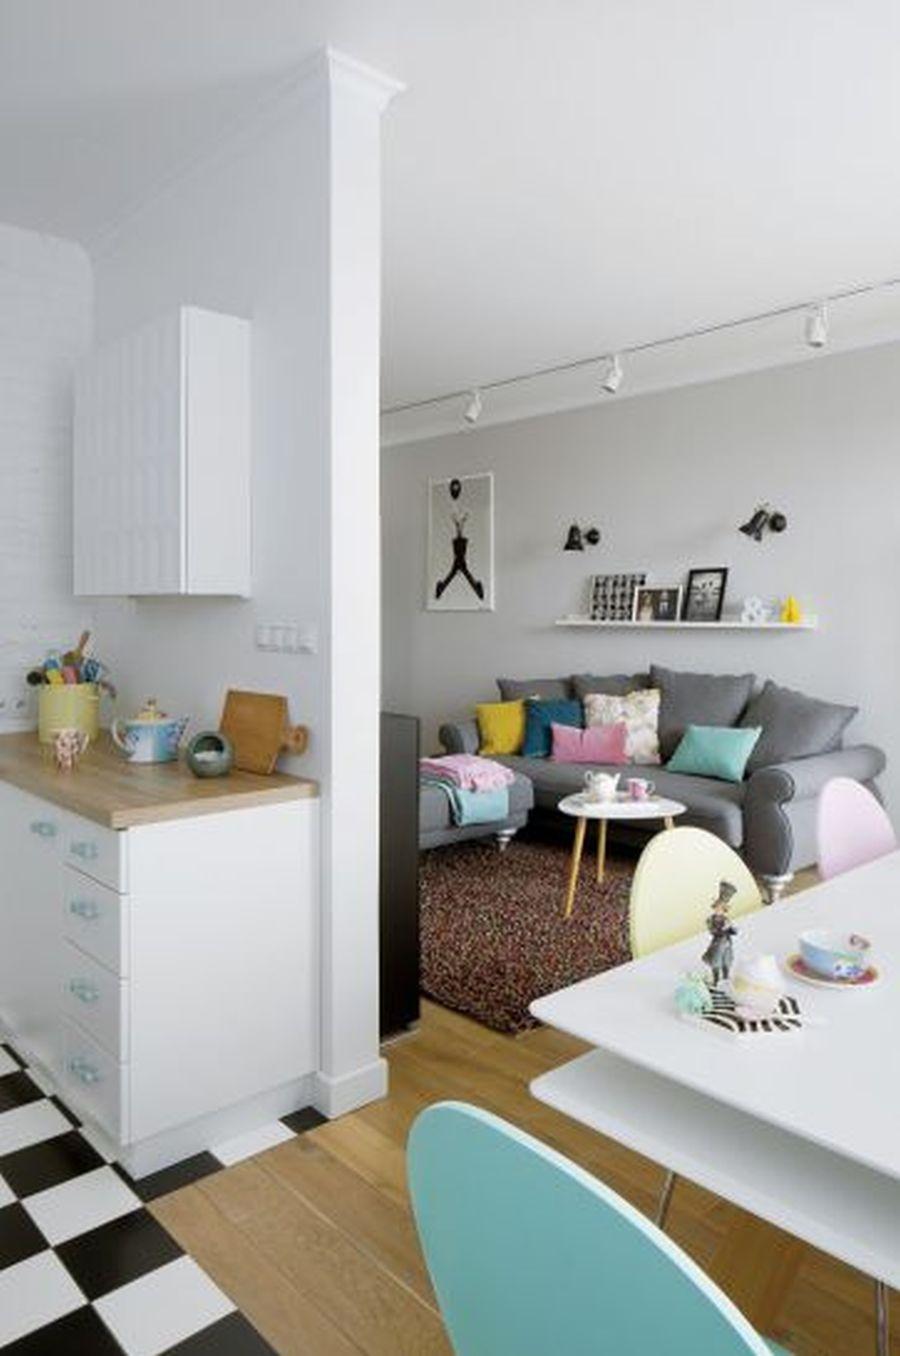 adelaparvu.com despre apartament in culori pastelate, Designer Patricia Rabinska, Foto Yassen Hristov (7)